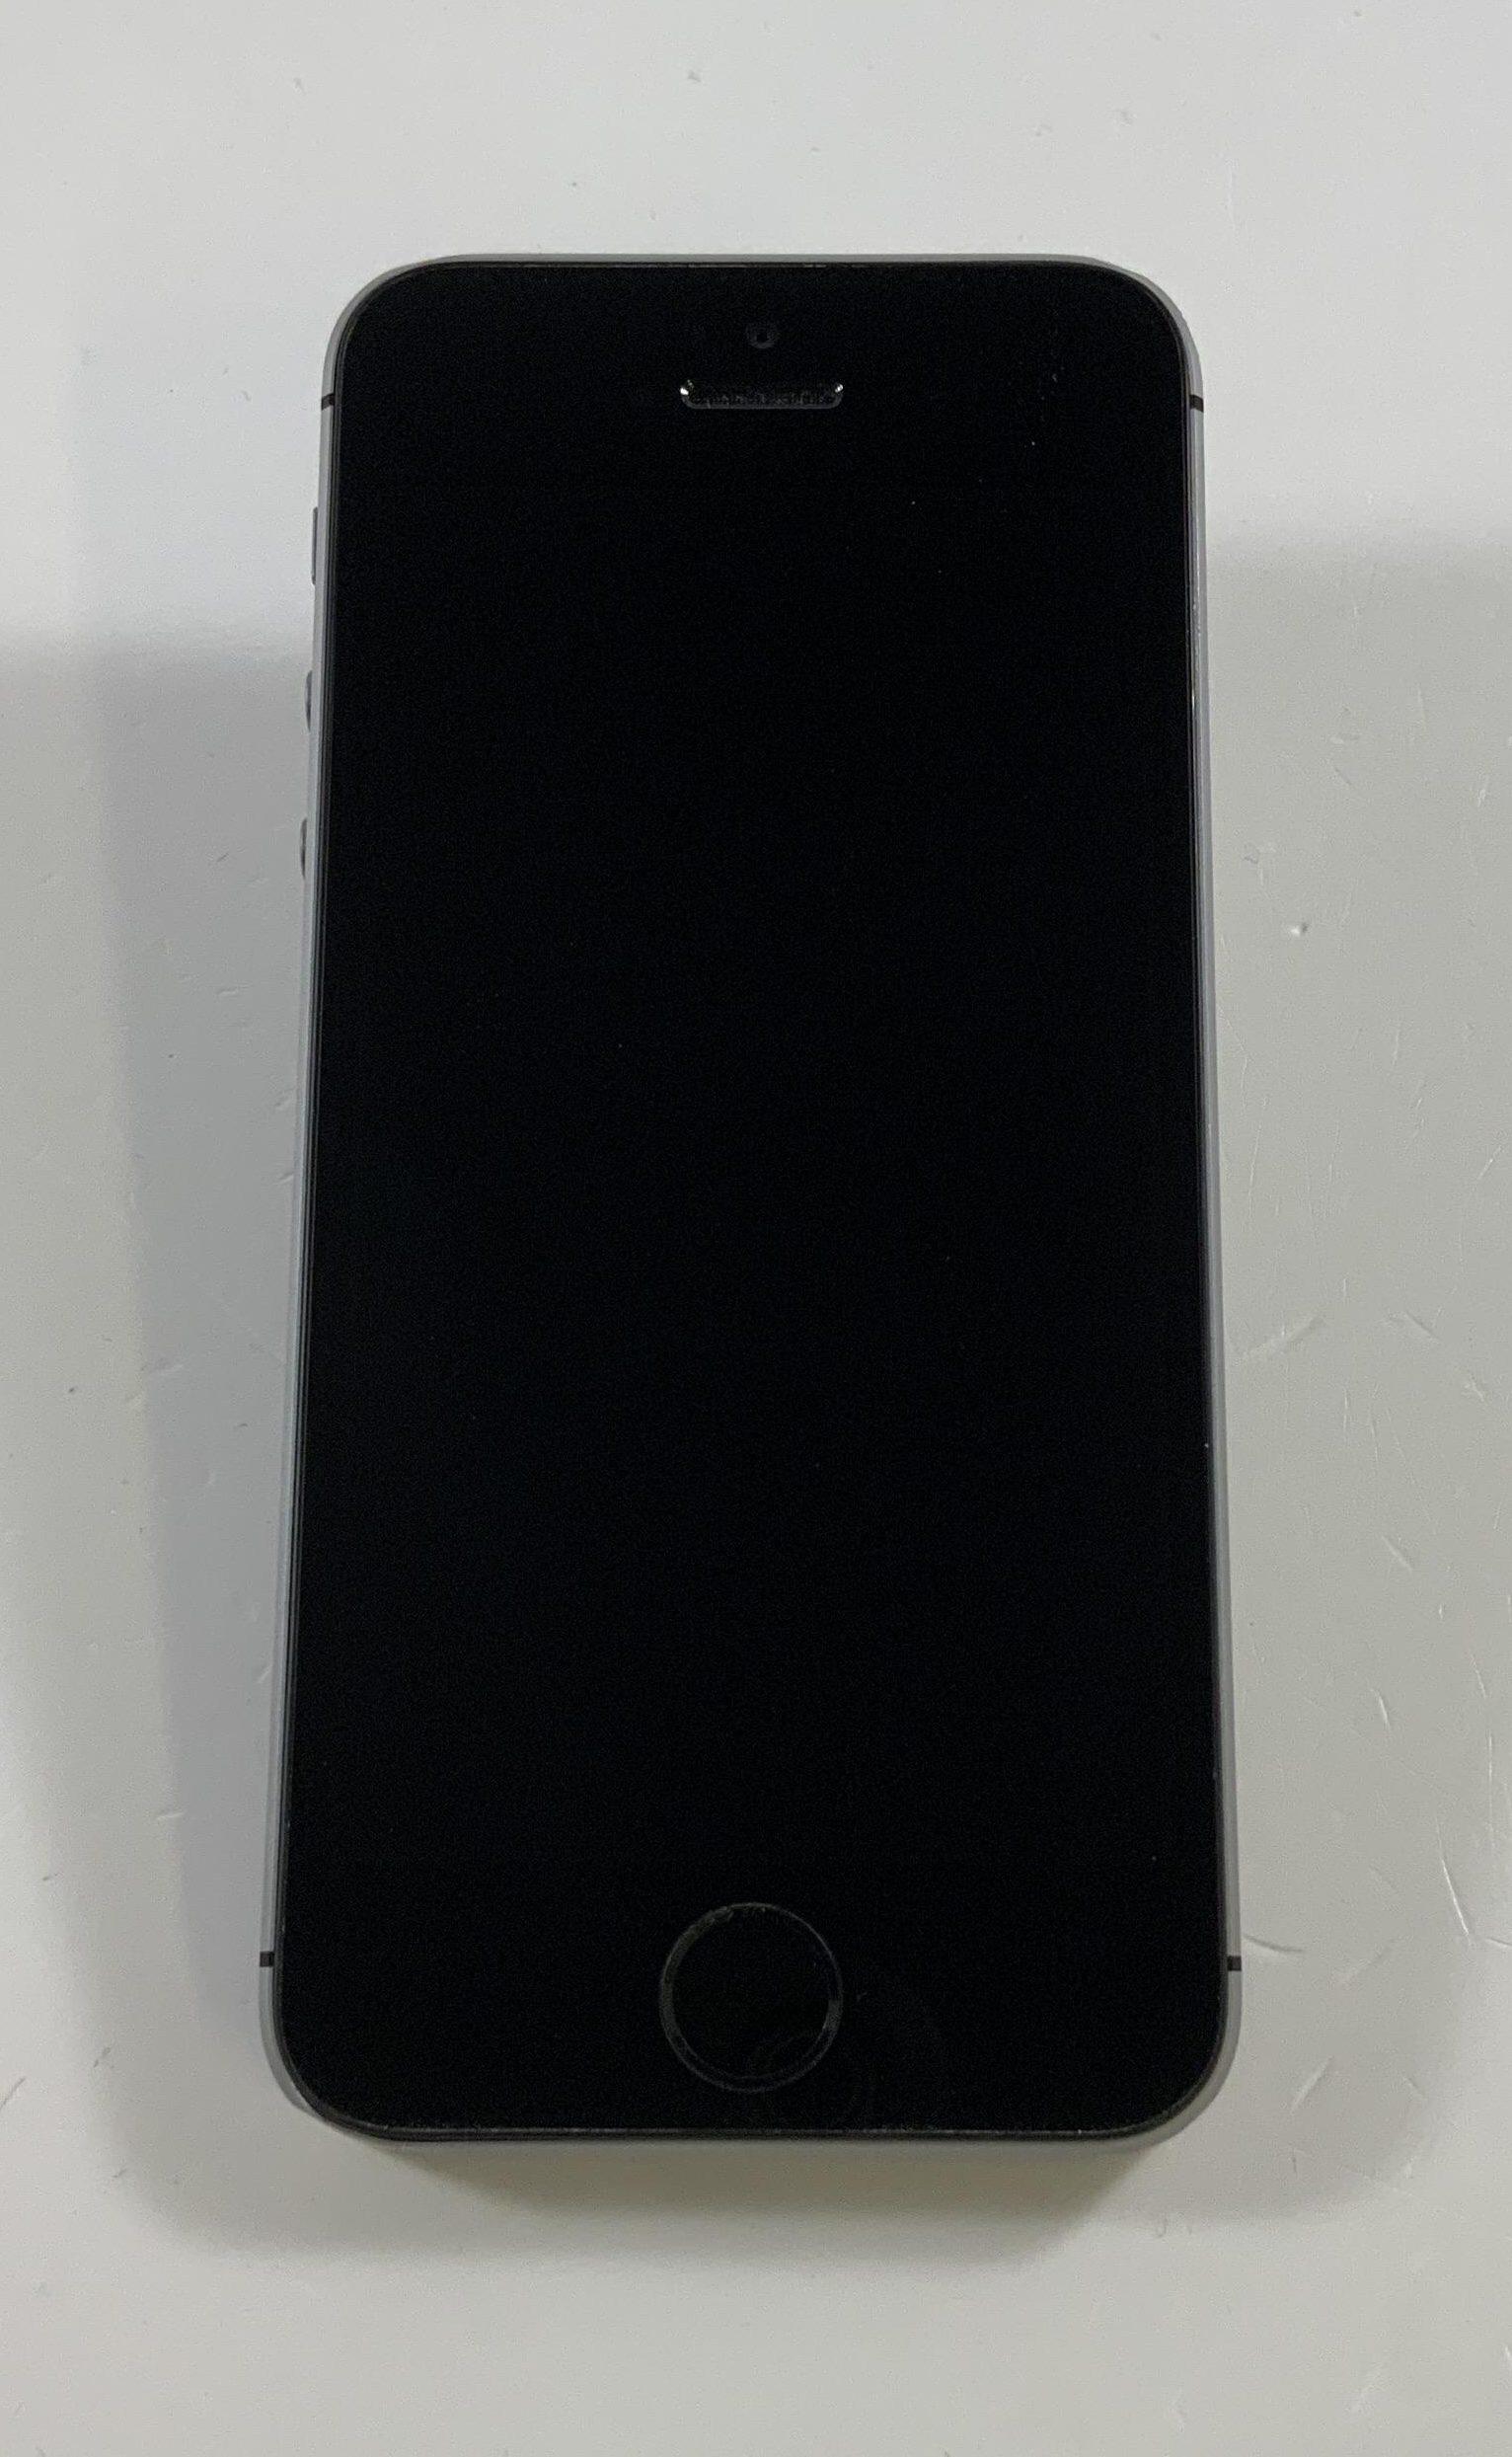 iPhone SE 32GB, 32GB, Space Gray, image 1